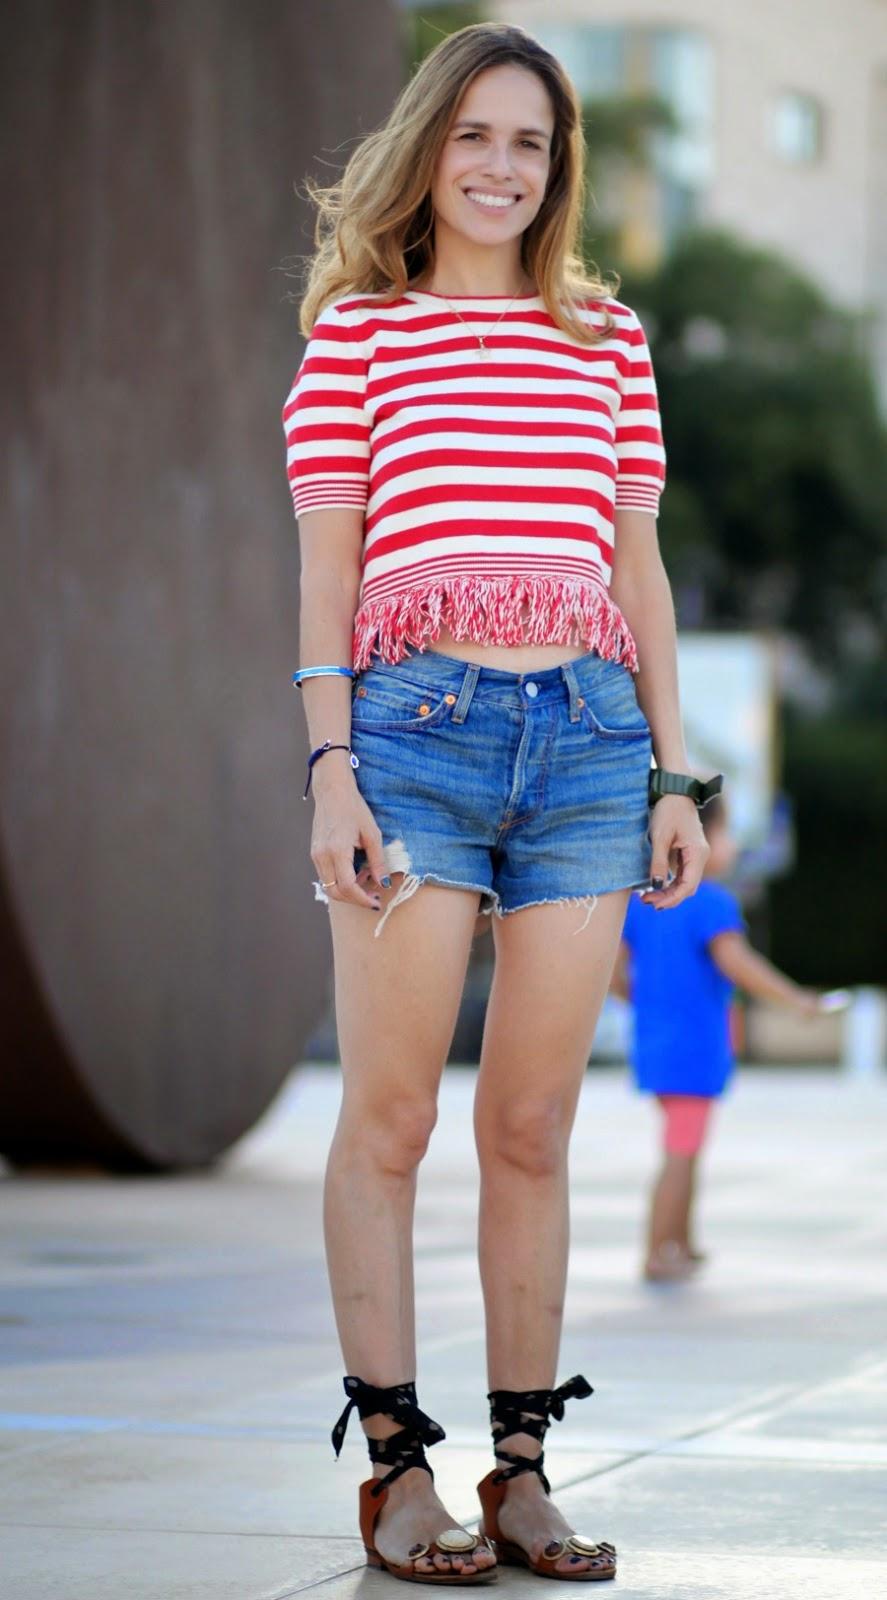 501, levi's, shortdenims, style, lookoftheday, stripes, fashionblog, bradpiit,אופנה, בלוגאופנה